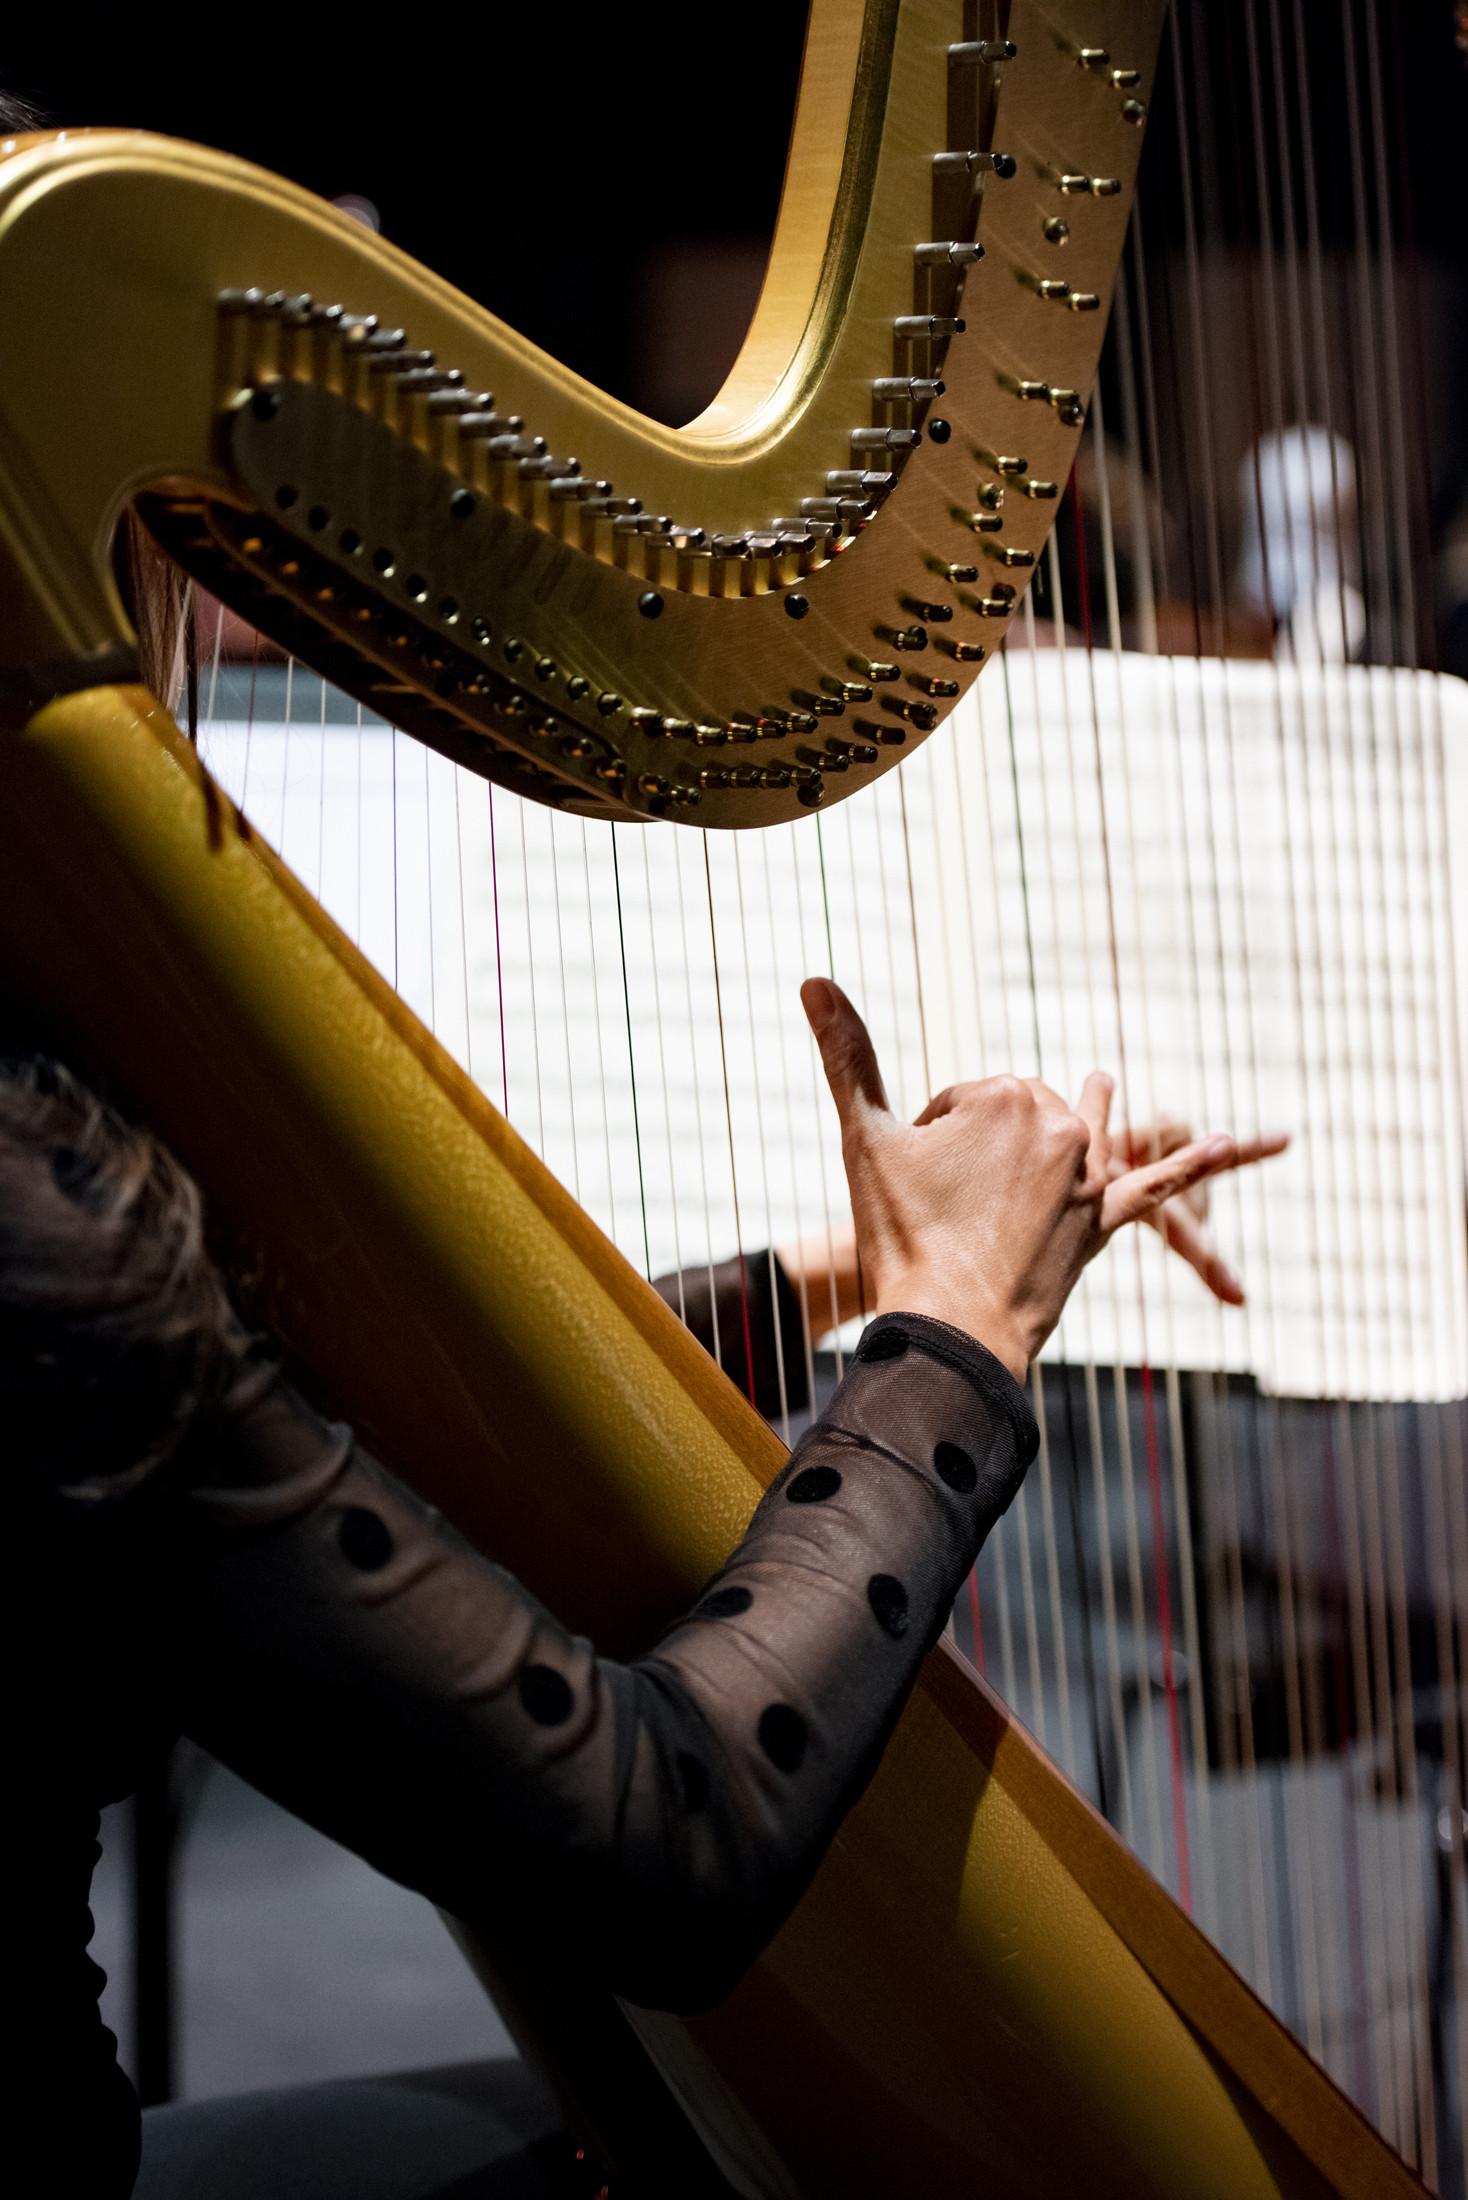 https://ams3.digitaloceanspaces.com/residentie-orkest-preview/assets/Aanvoerder Harp (50%)